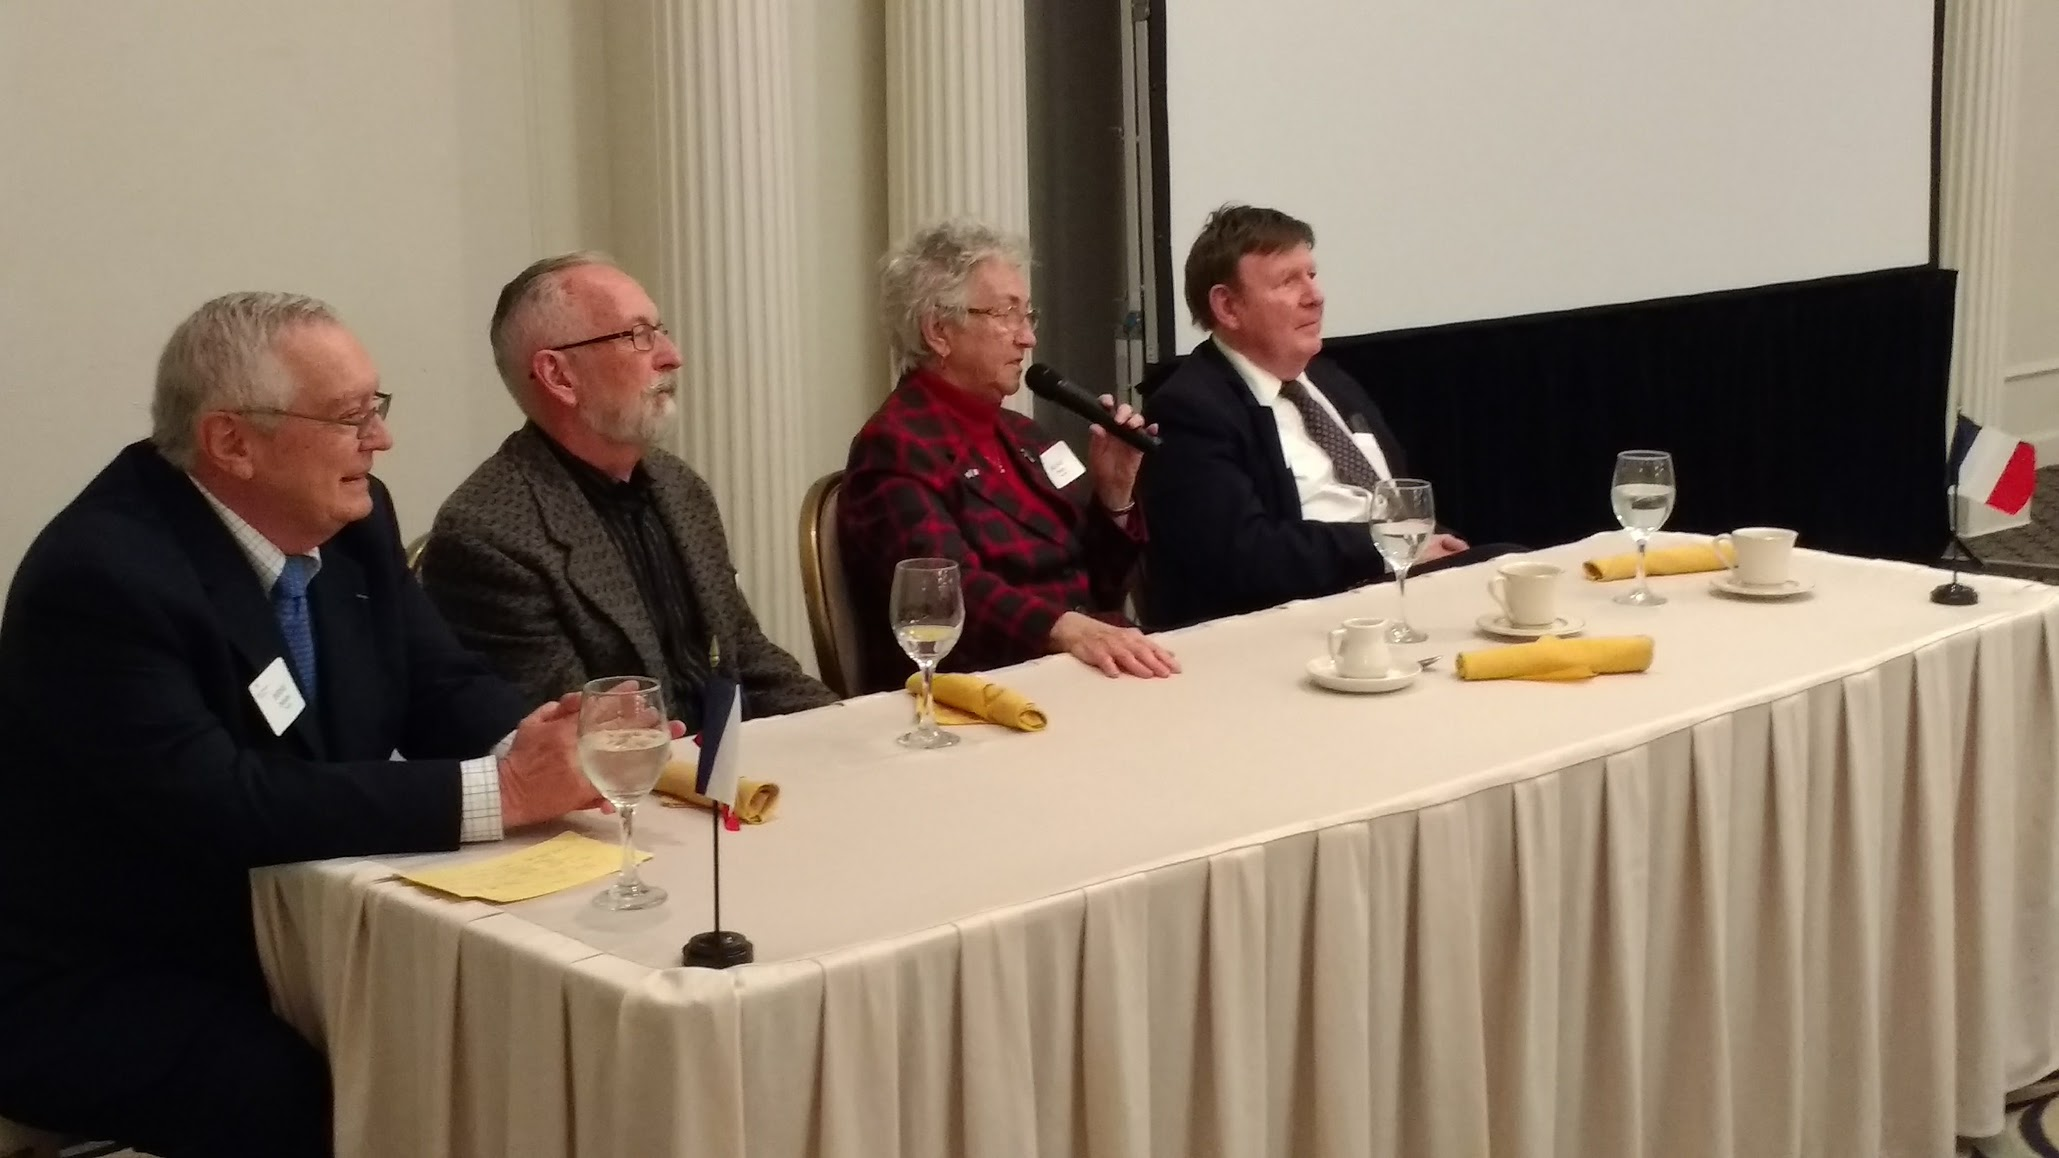 Our distinguished panelists, Bernie Duhaime, Michael James, Sr. Aline Paris, and Tom Coffey (moderator)